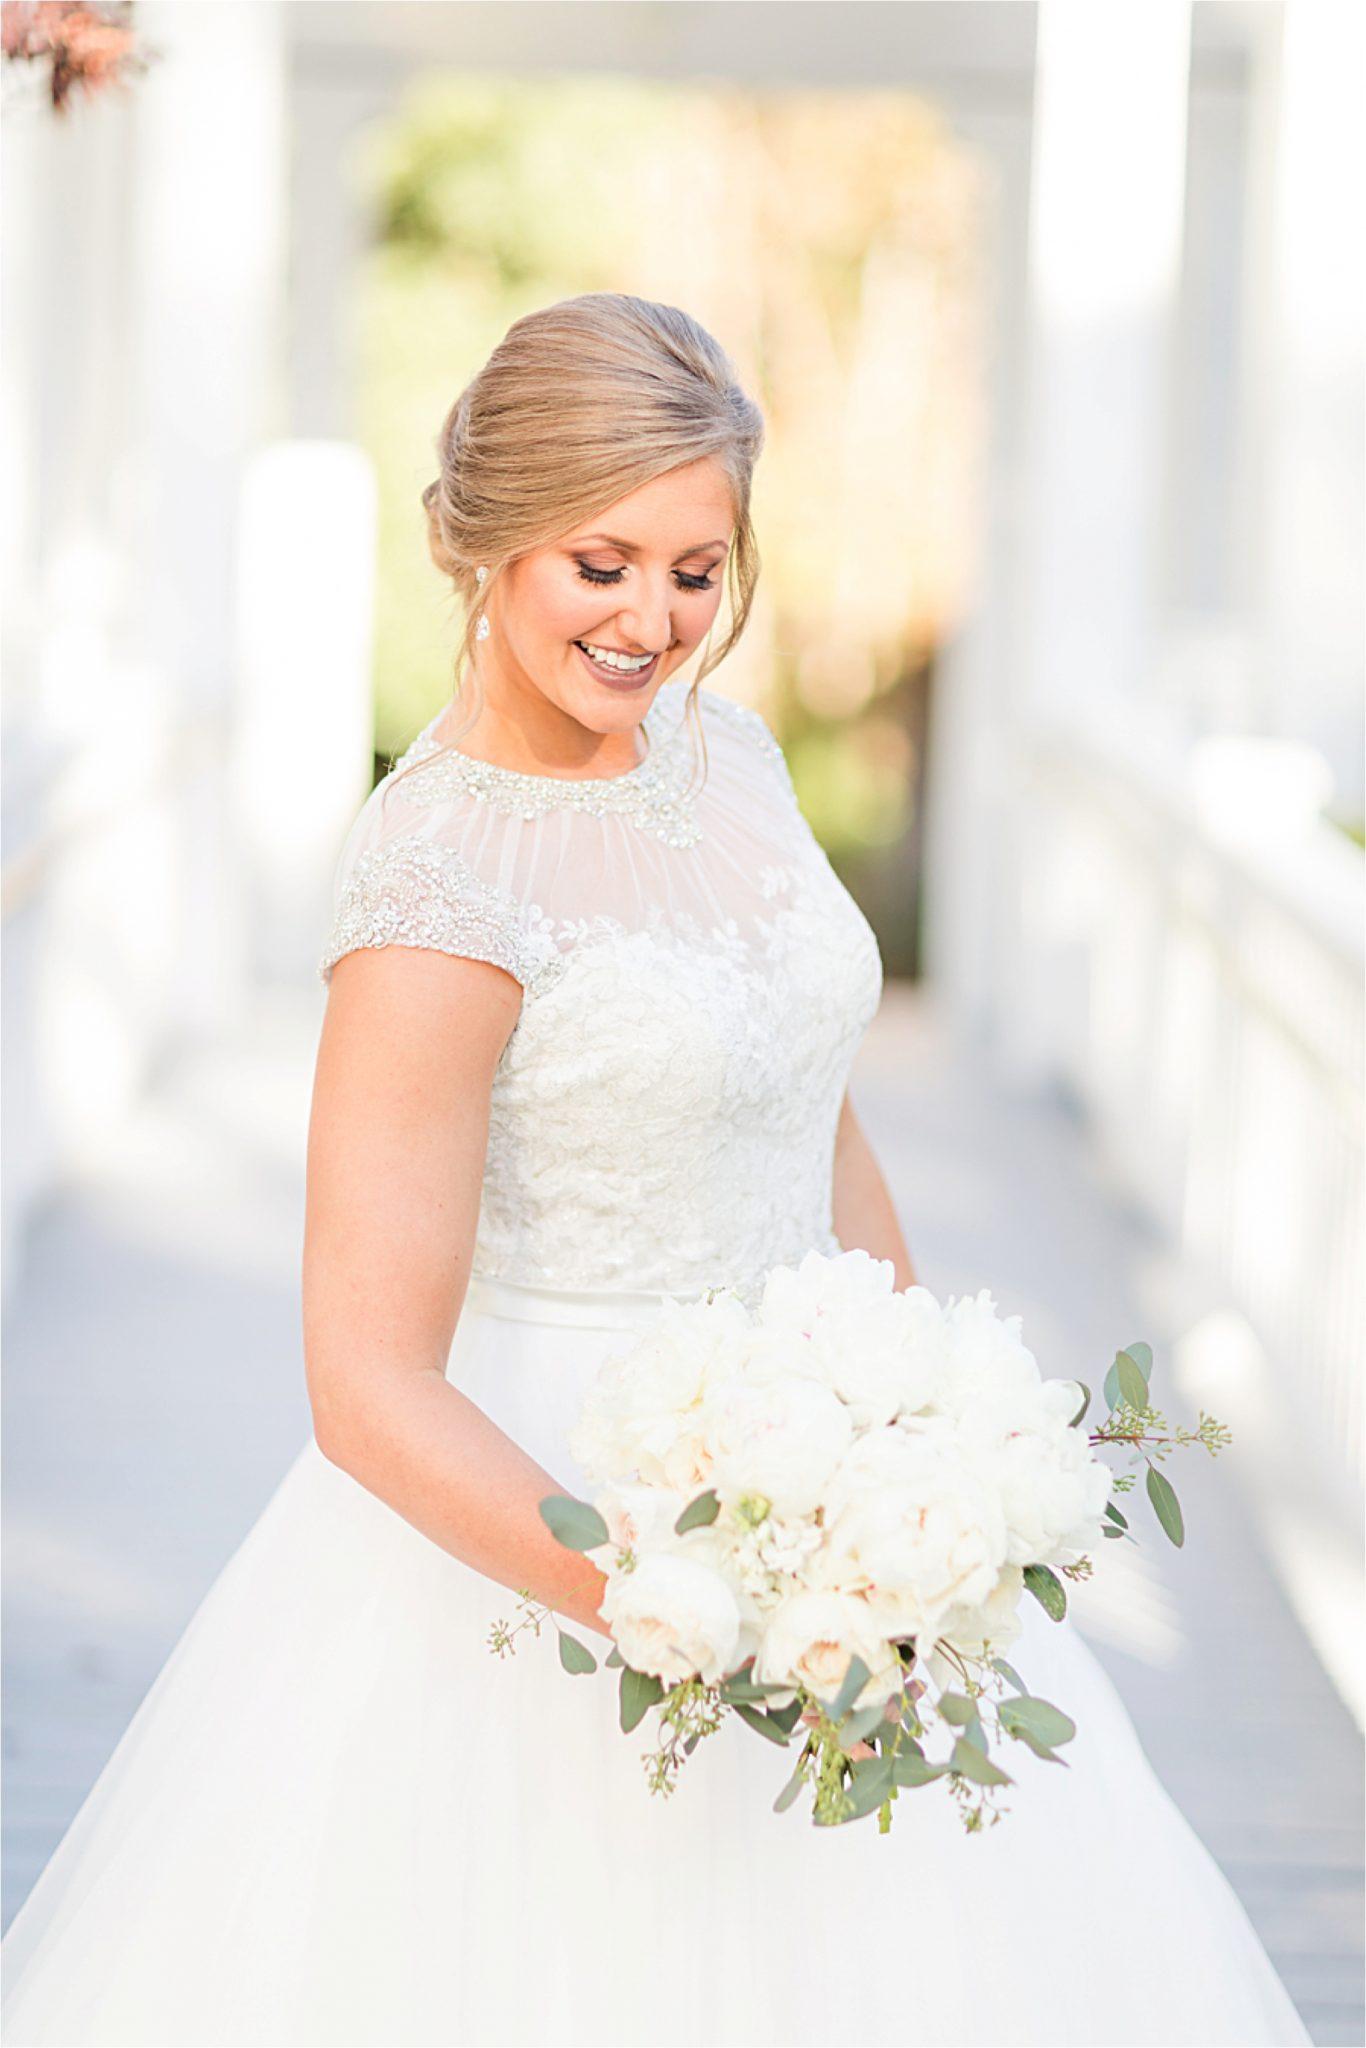 St Francis at the Point Bridal Portraits-Mary Catherine-Alabama photographer-Bridal Shoot-Candid-Wedding Dress-Wedding Bouquet